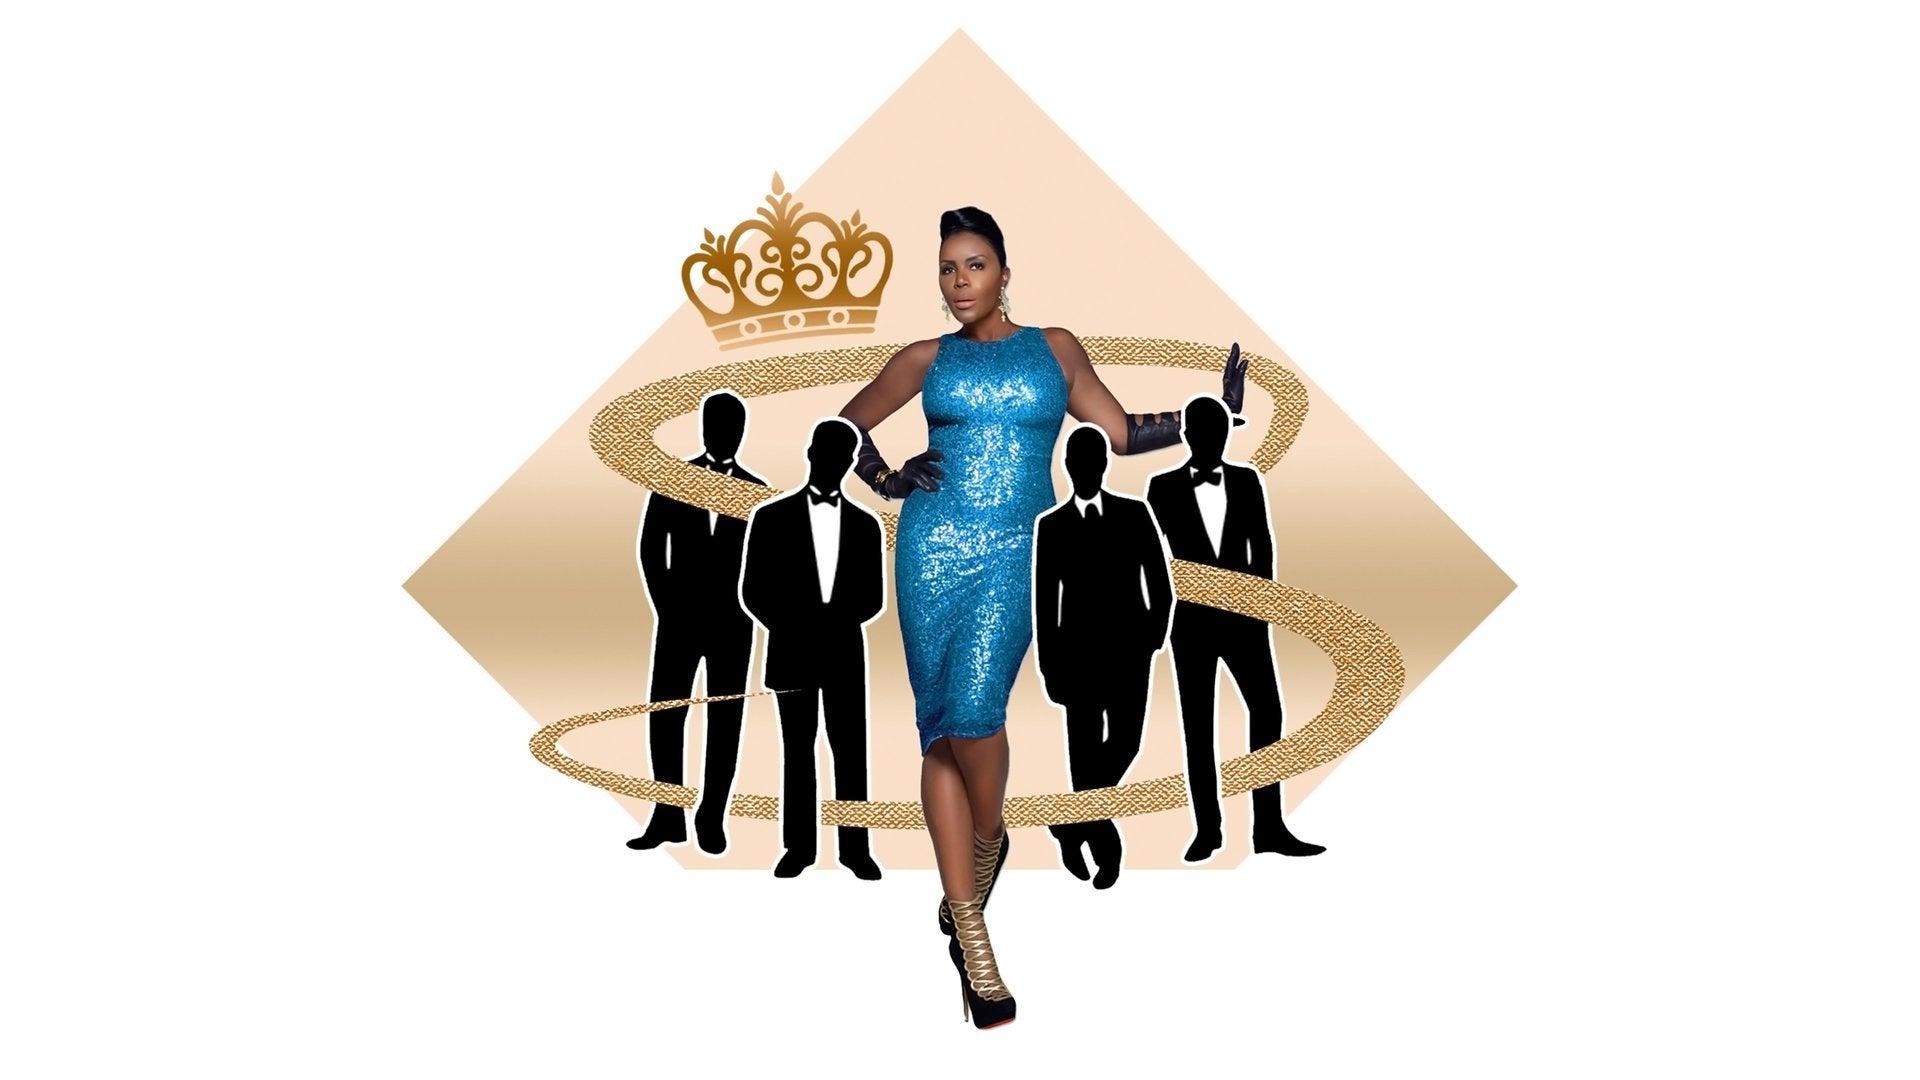 Sommore: All the Queen's Men